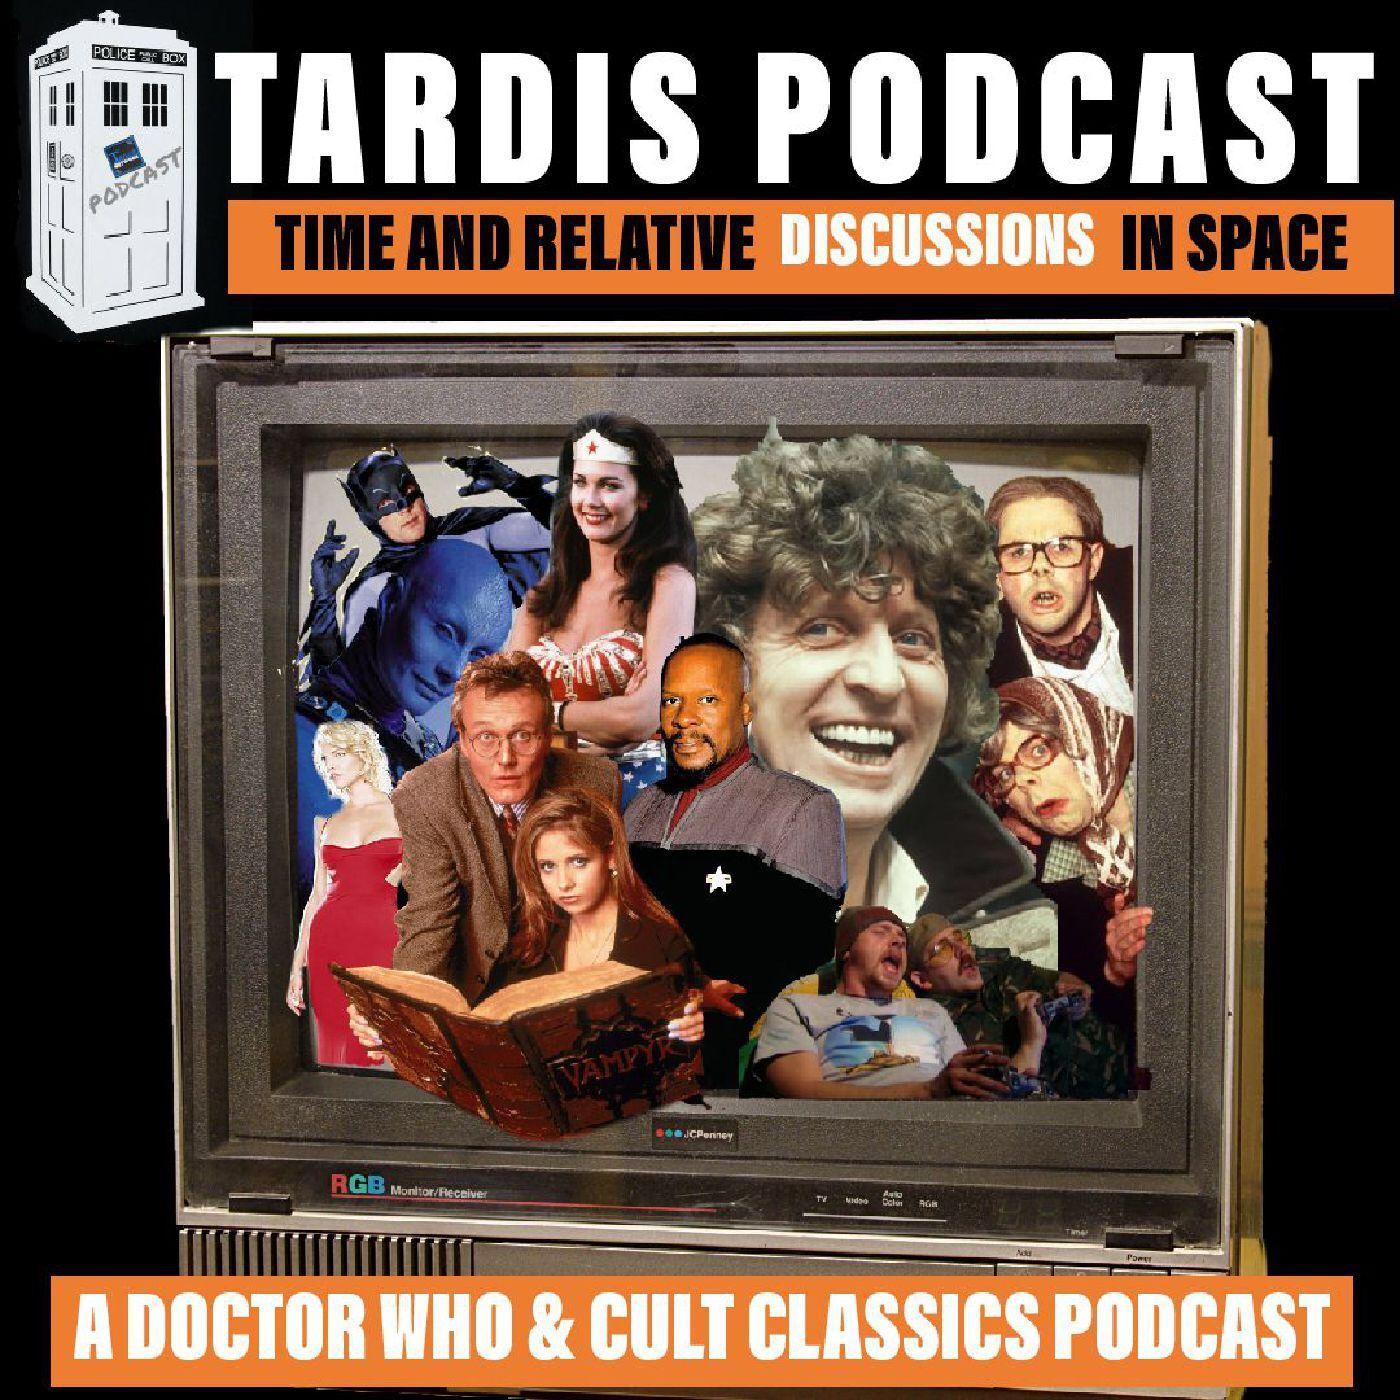 The Tardis podcast